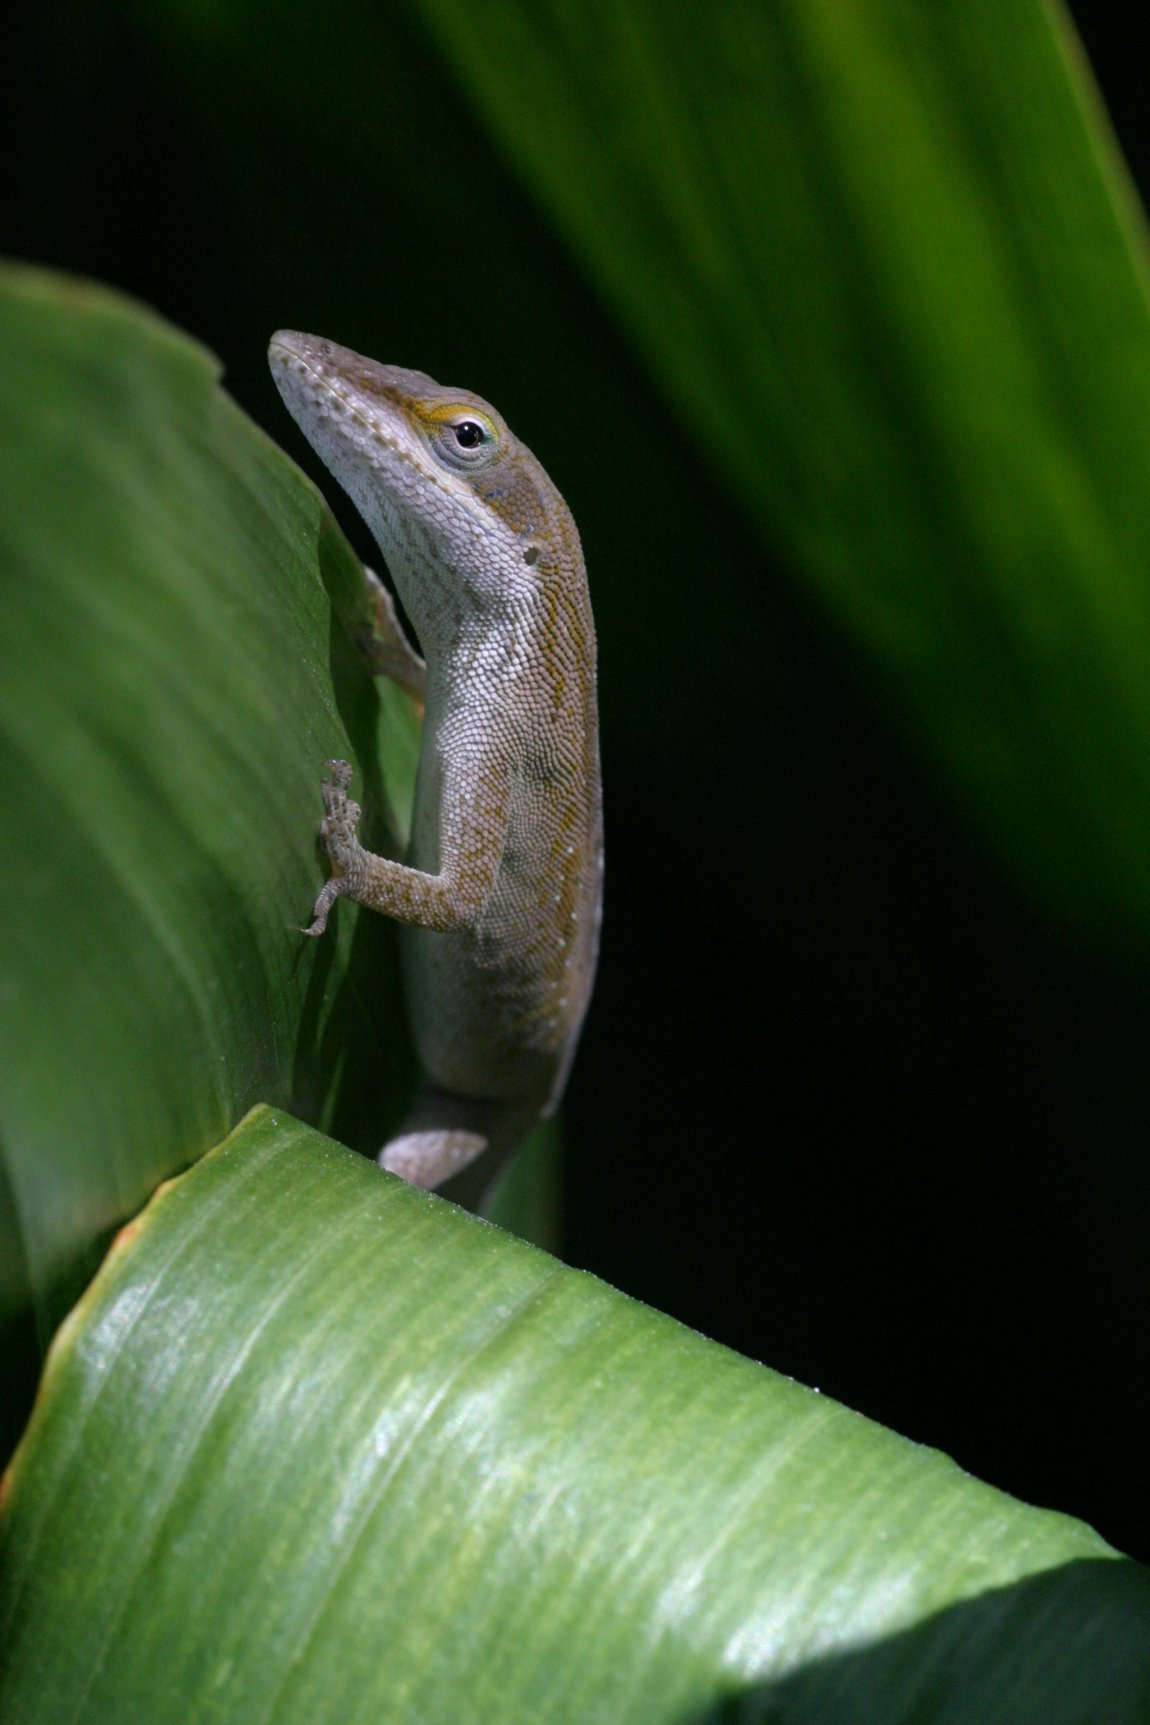 A green anole lizard (Anolis carolinensis) from Louisiana